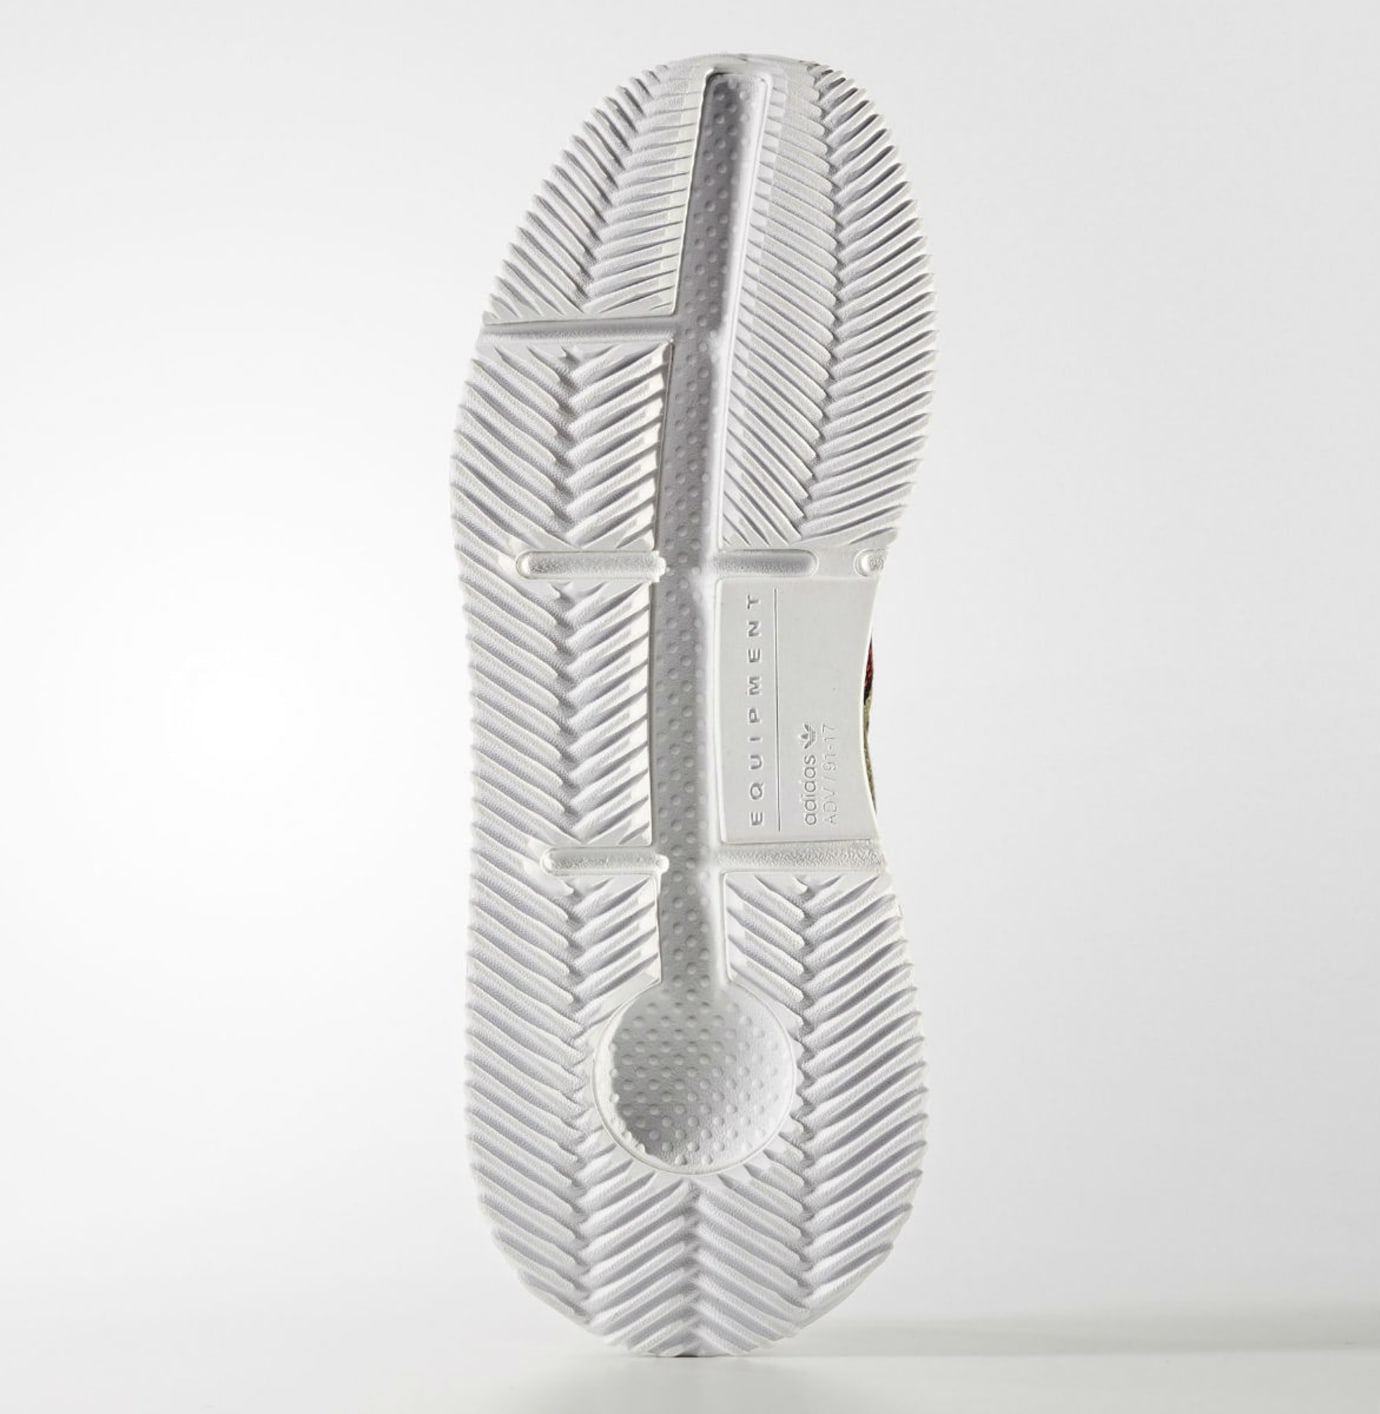 pick up bd76c 39ce9 Adidas EQT Cushion ADV Olive Camo Release Date AC7722 Sole